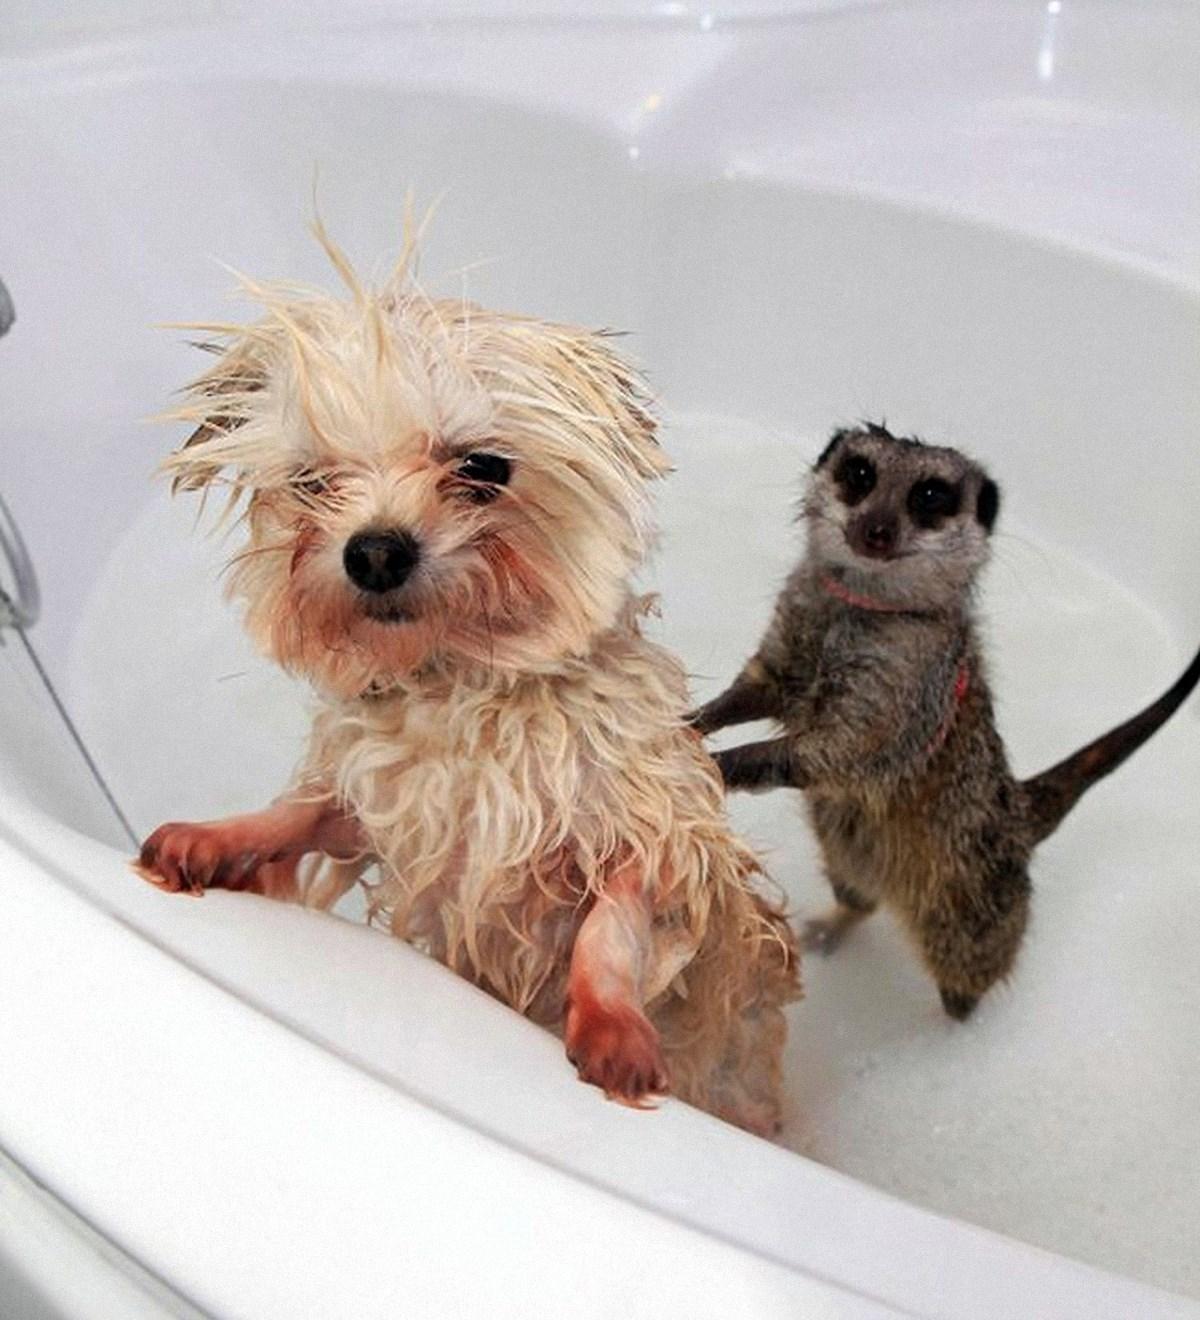 00 animals bath 03. 280715